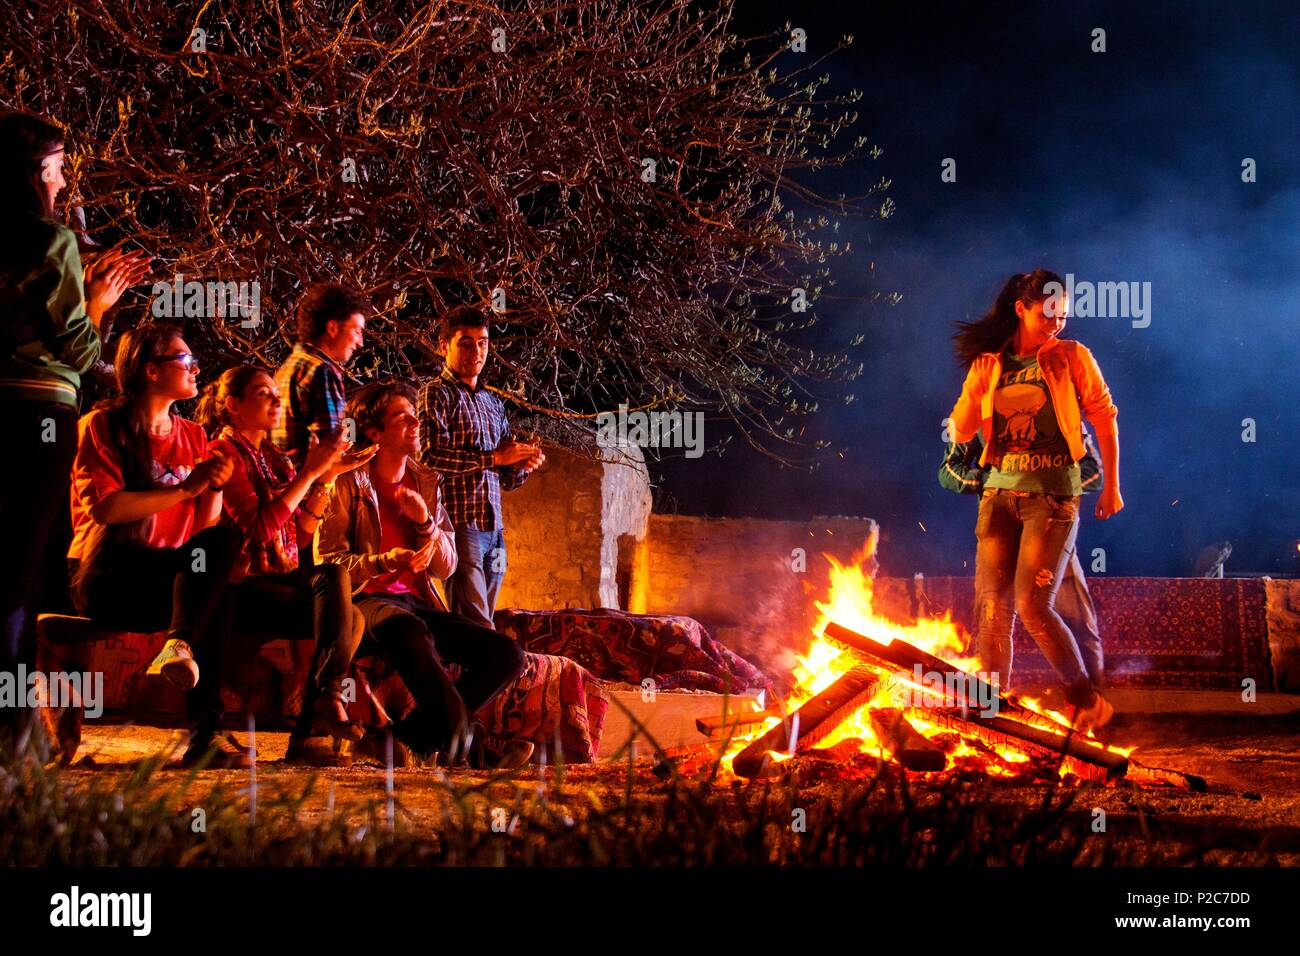 Azerbaijan, viciniti Baku, Absheron Peninsula, Gala (Qala) Village, Azerbaijani teens perform a bonfire jumping ritual during a Novruz (new year in ancient Perisa) celebration - Stock Image